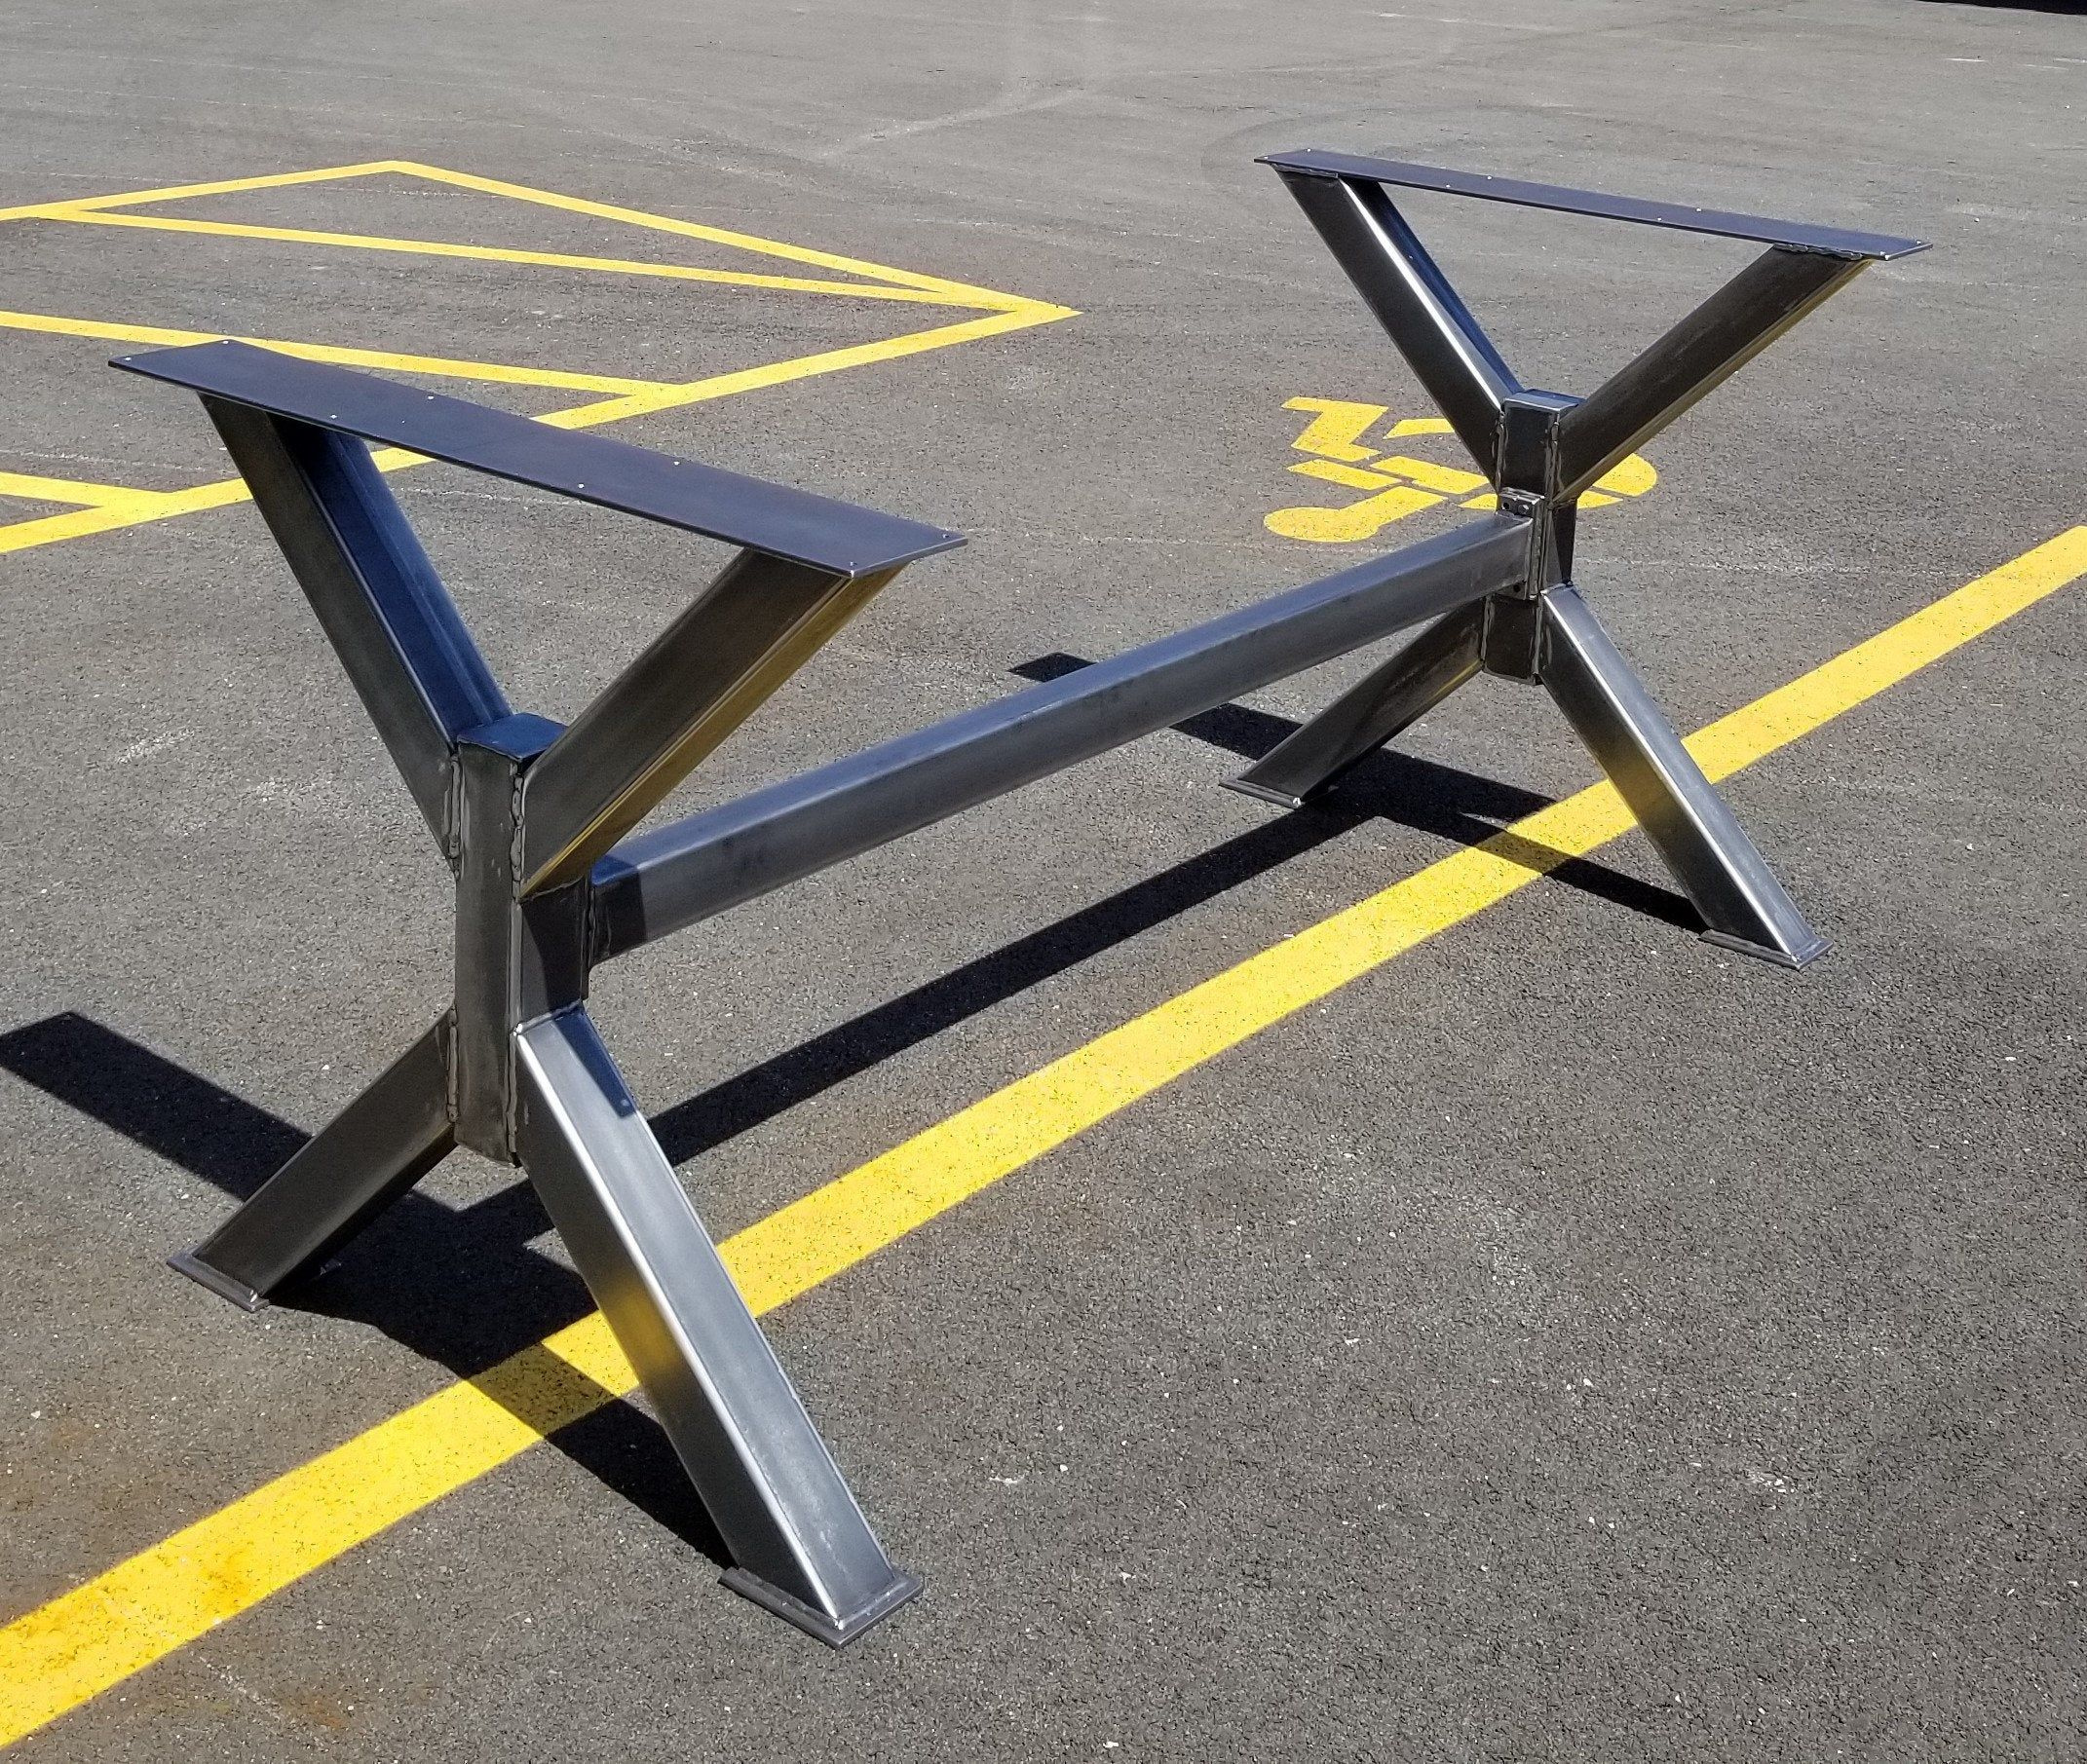 New Design Trestle Table Legs with 1 Brace, Model TR12NB1